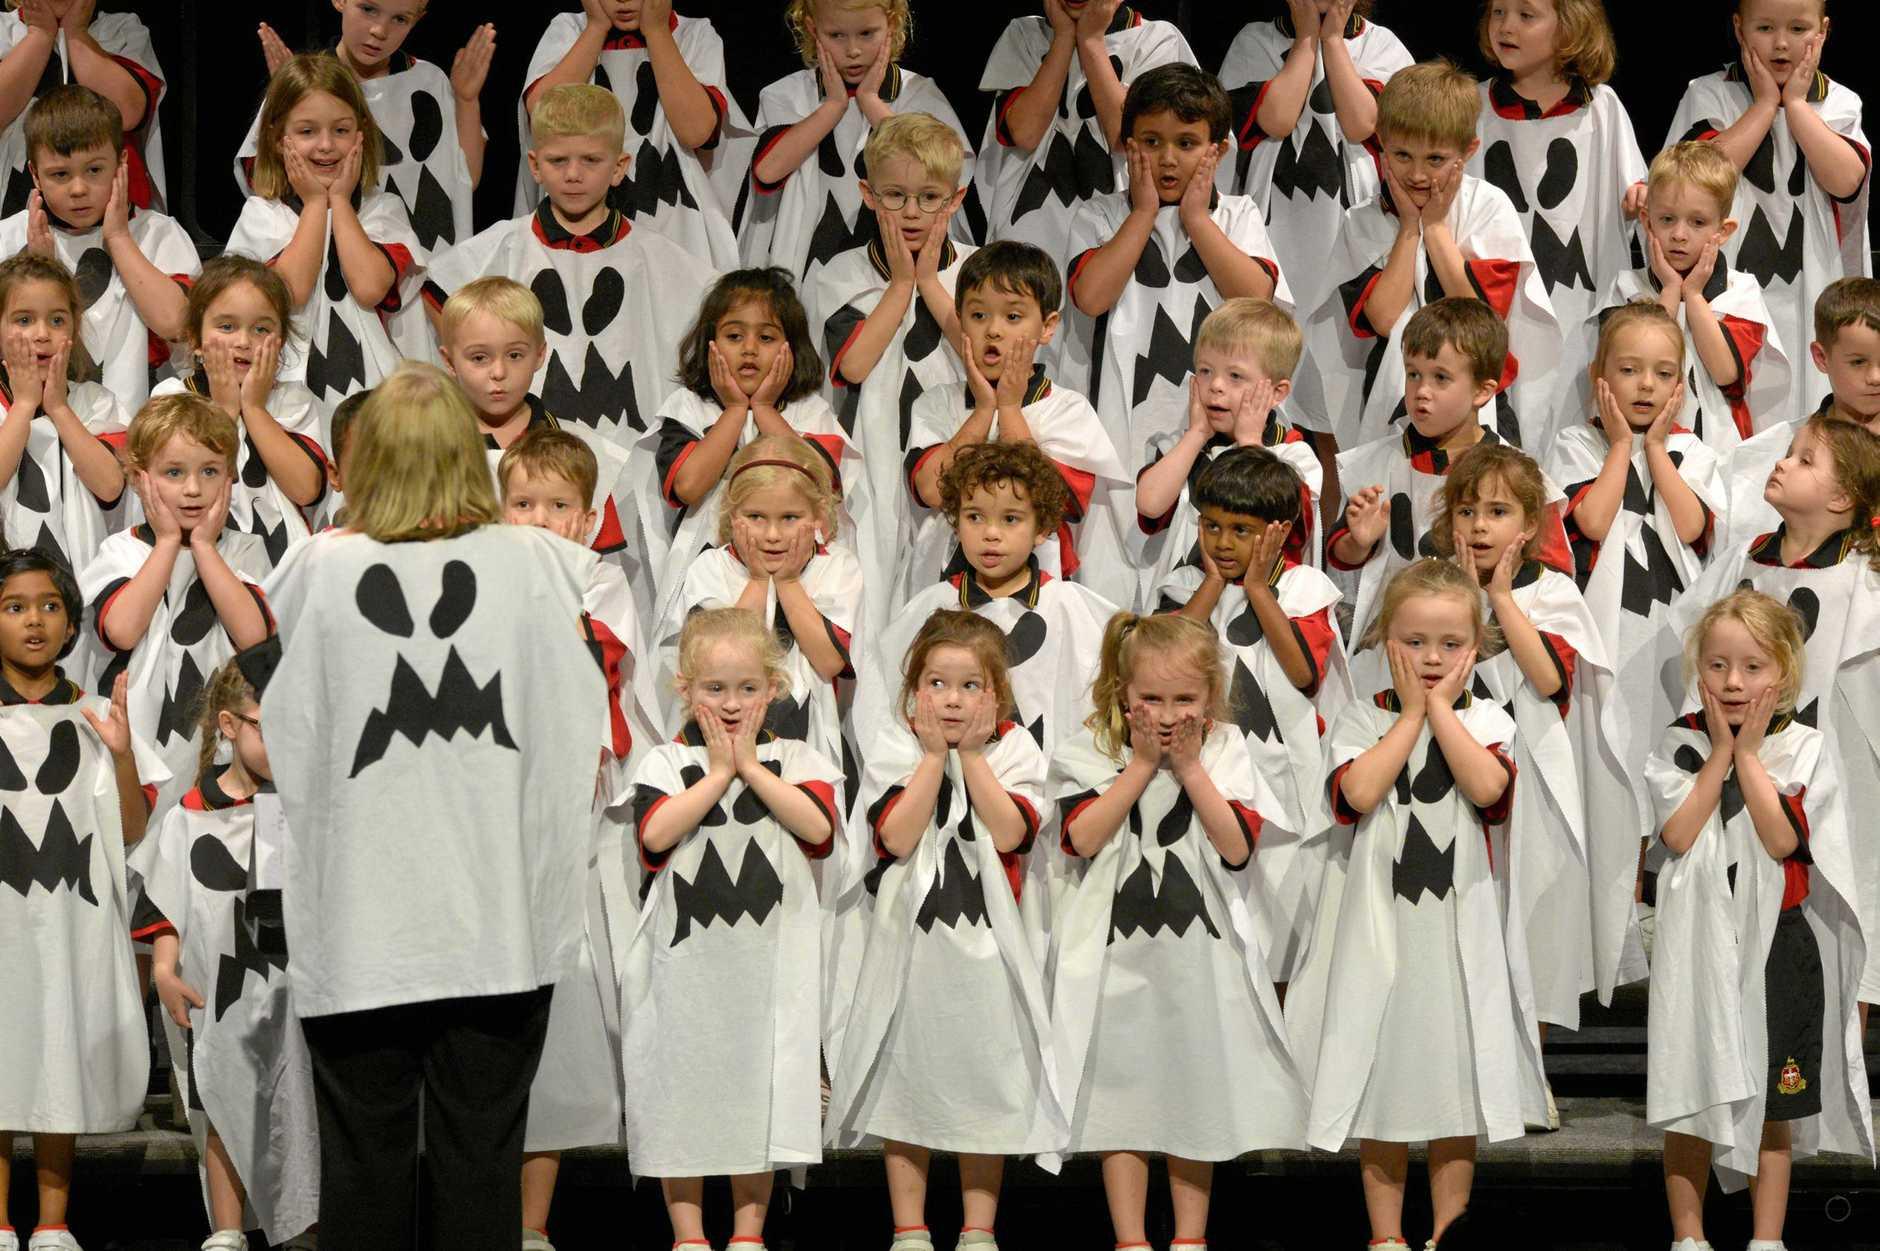 Rockhampton Grammar School in Section 211 - Primary School Freestyle Novelty Choir Prep-3 (Graff Family perpetual trophy)